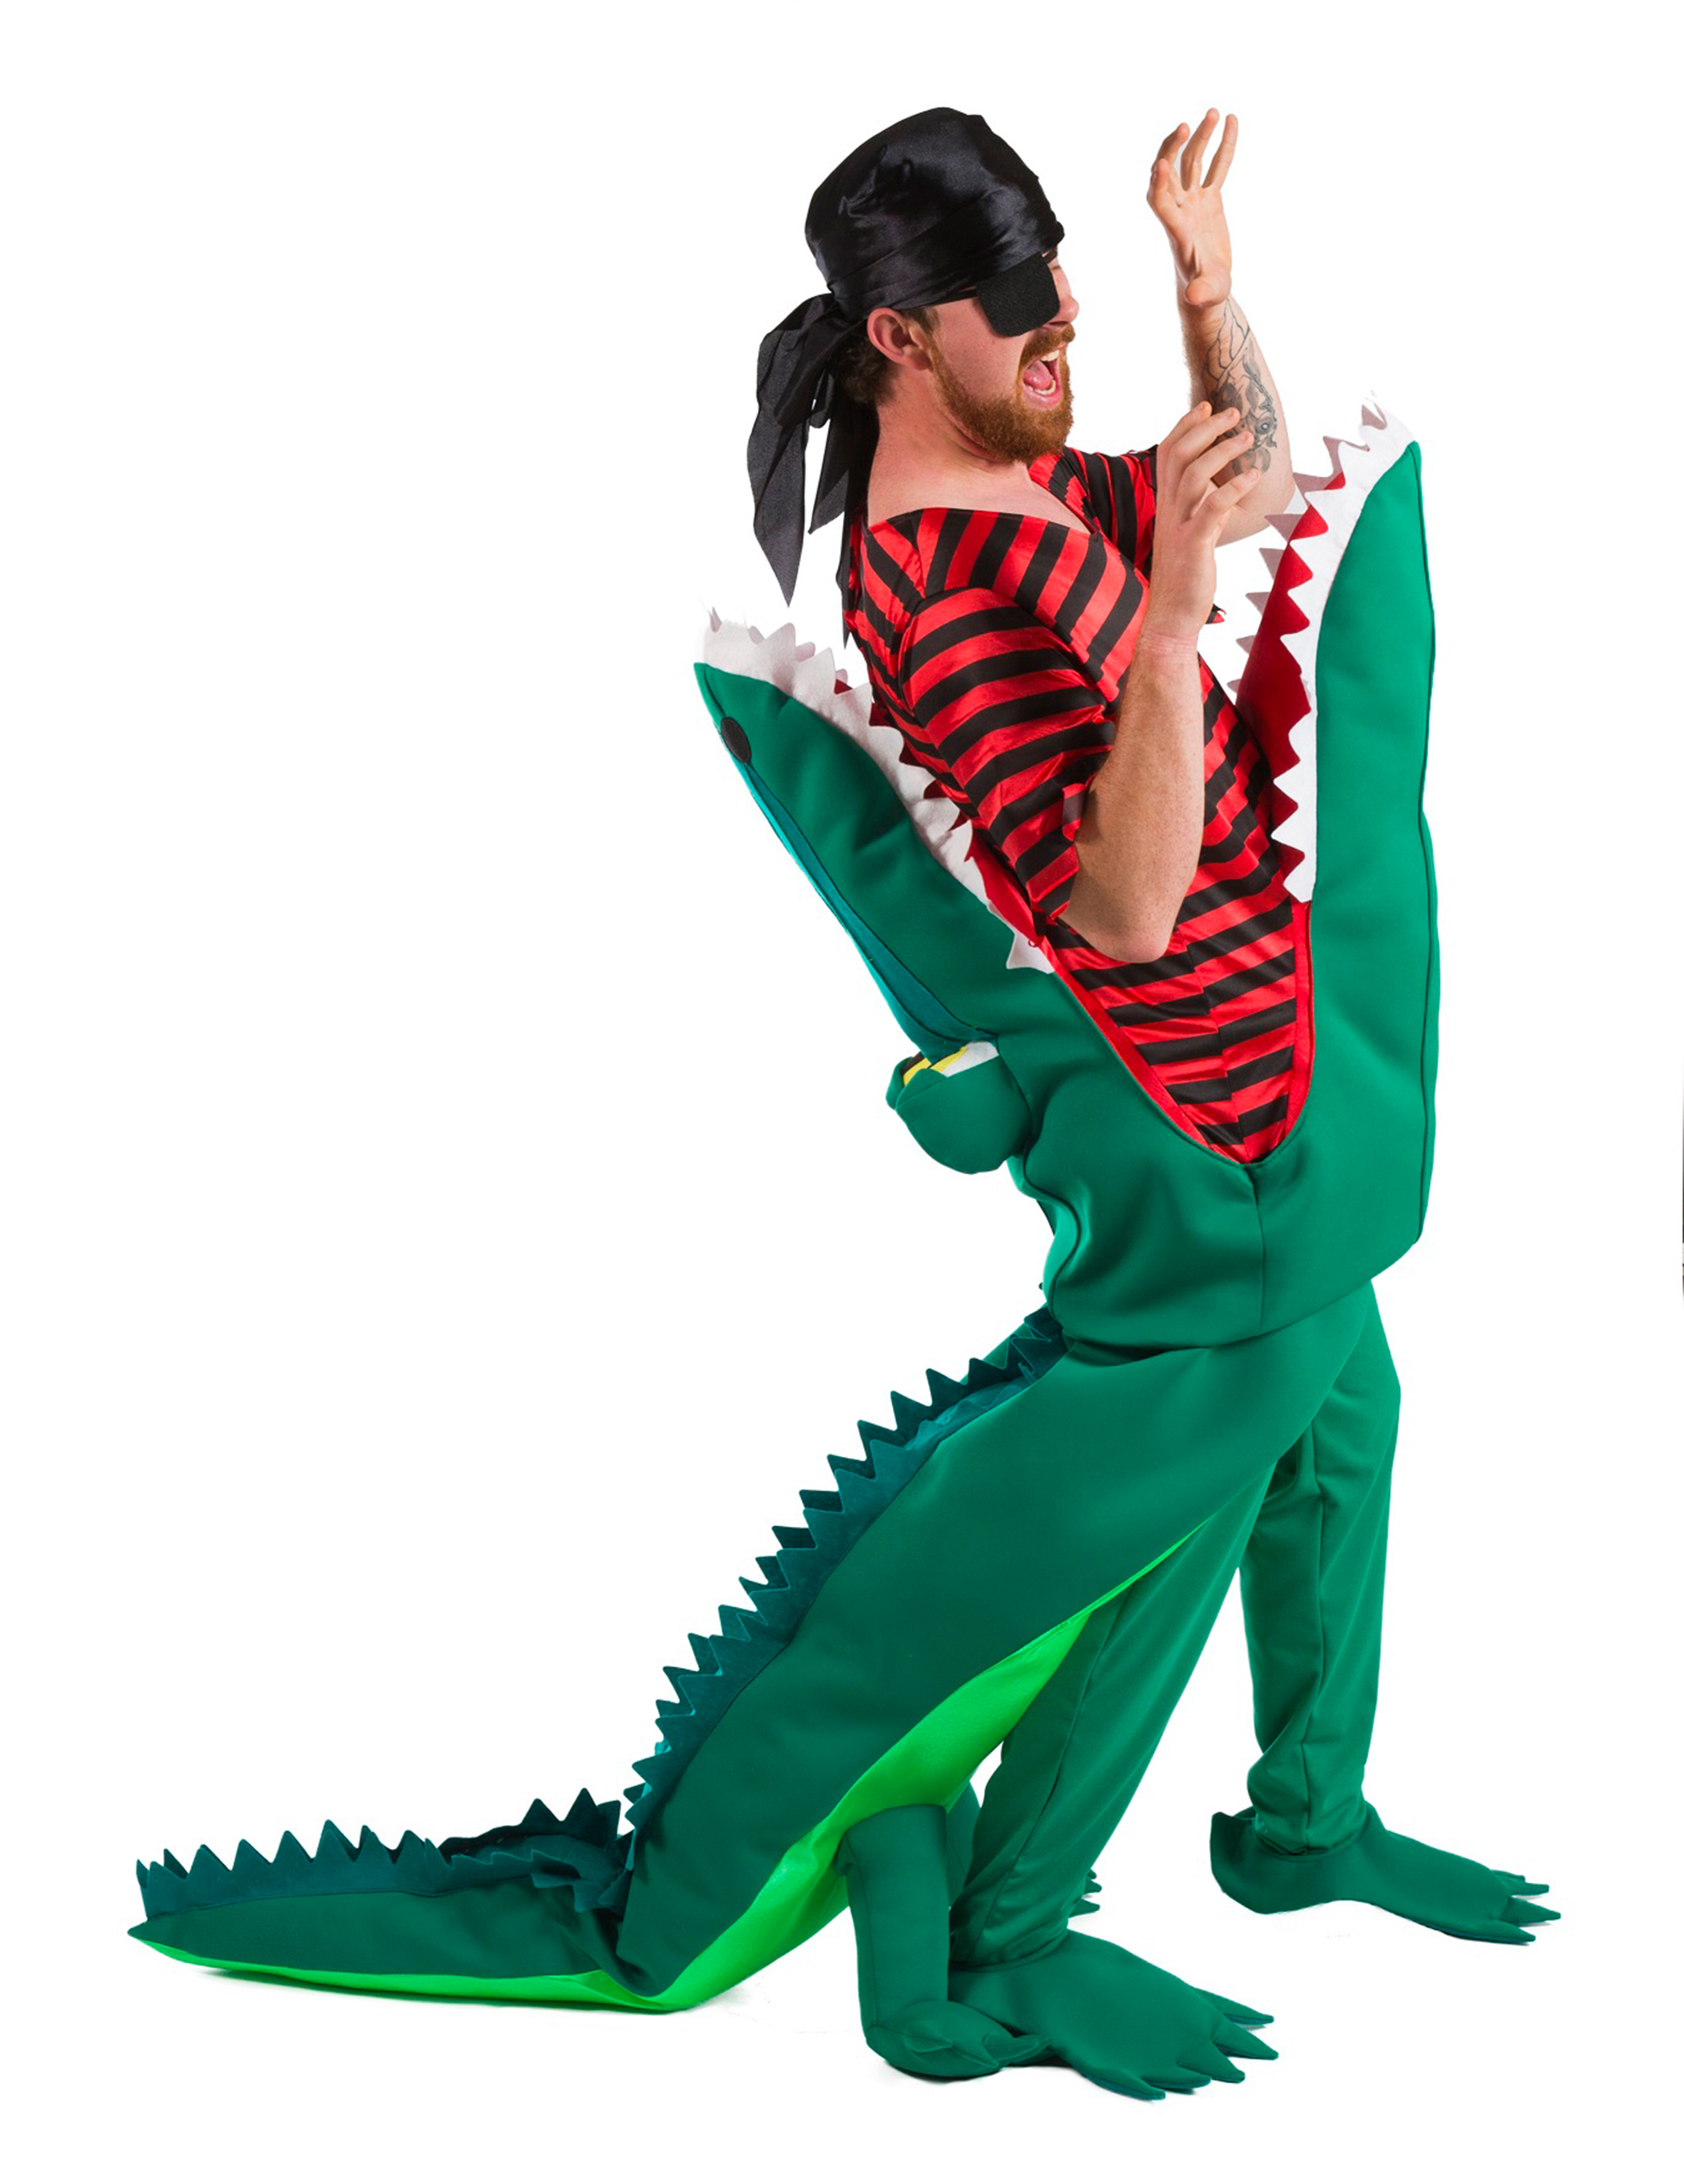 Lego Piraten 1 Krokodil in grün LEGO Bau- & Konstruktionsspielzeug Baukästen & Konstruktion